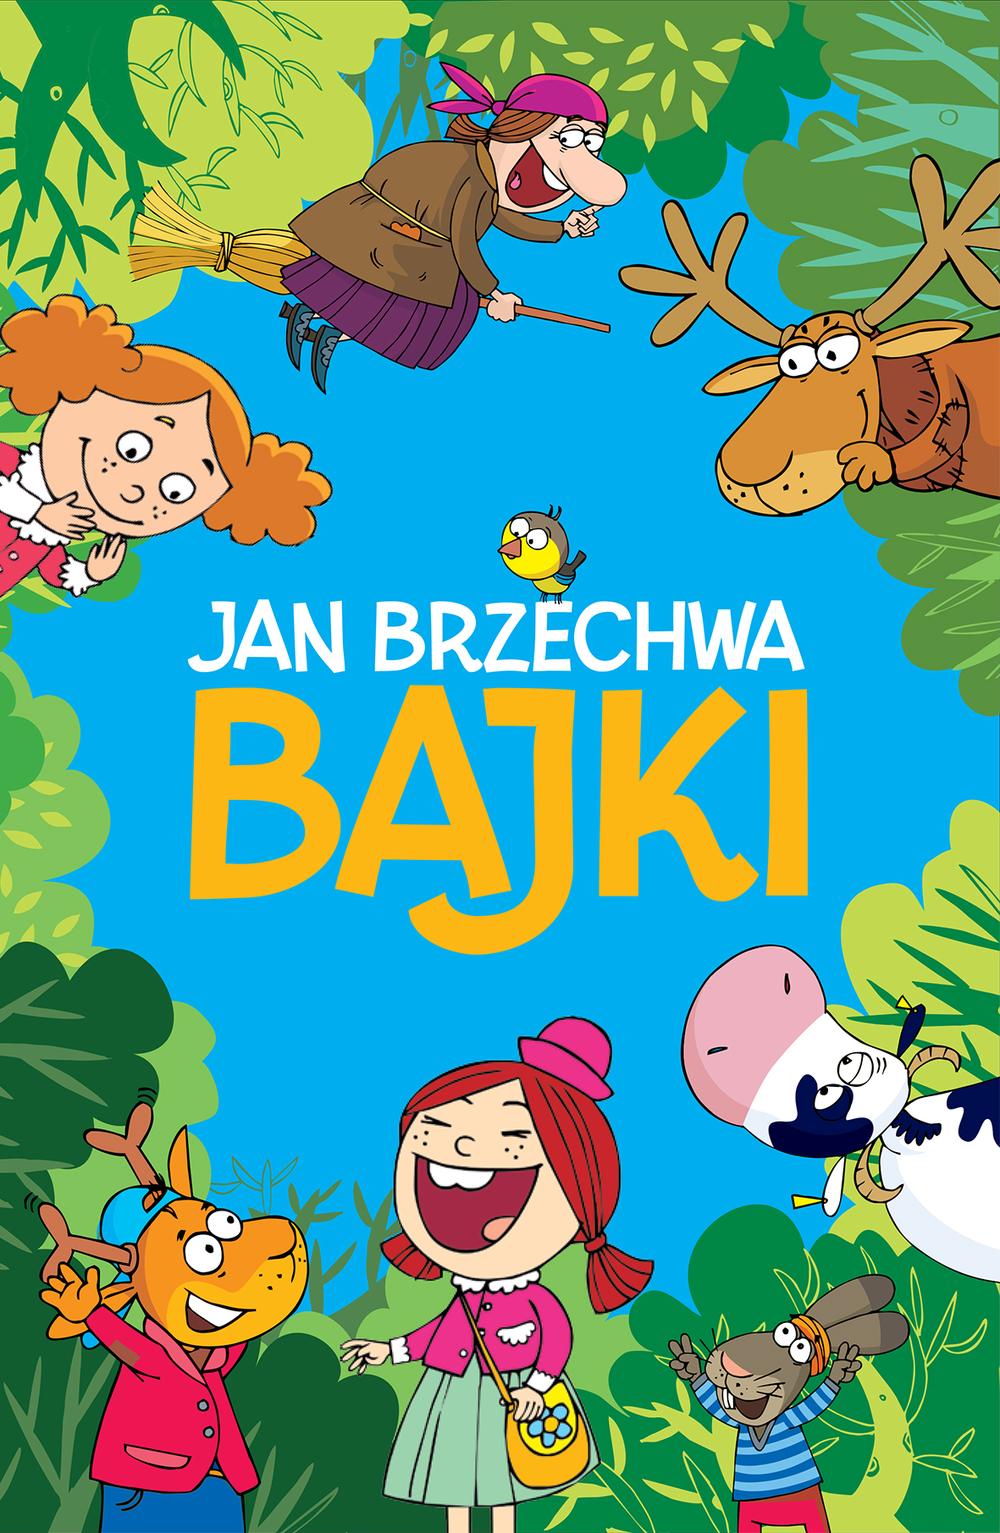 Bajki - Jan Brzechwa - JAN BRZECHWA